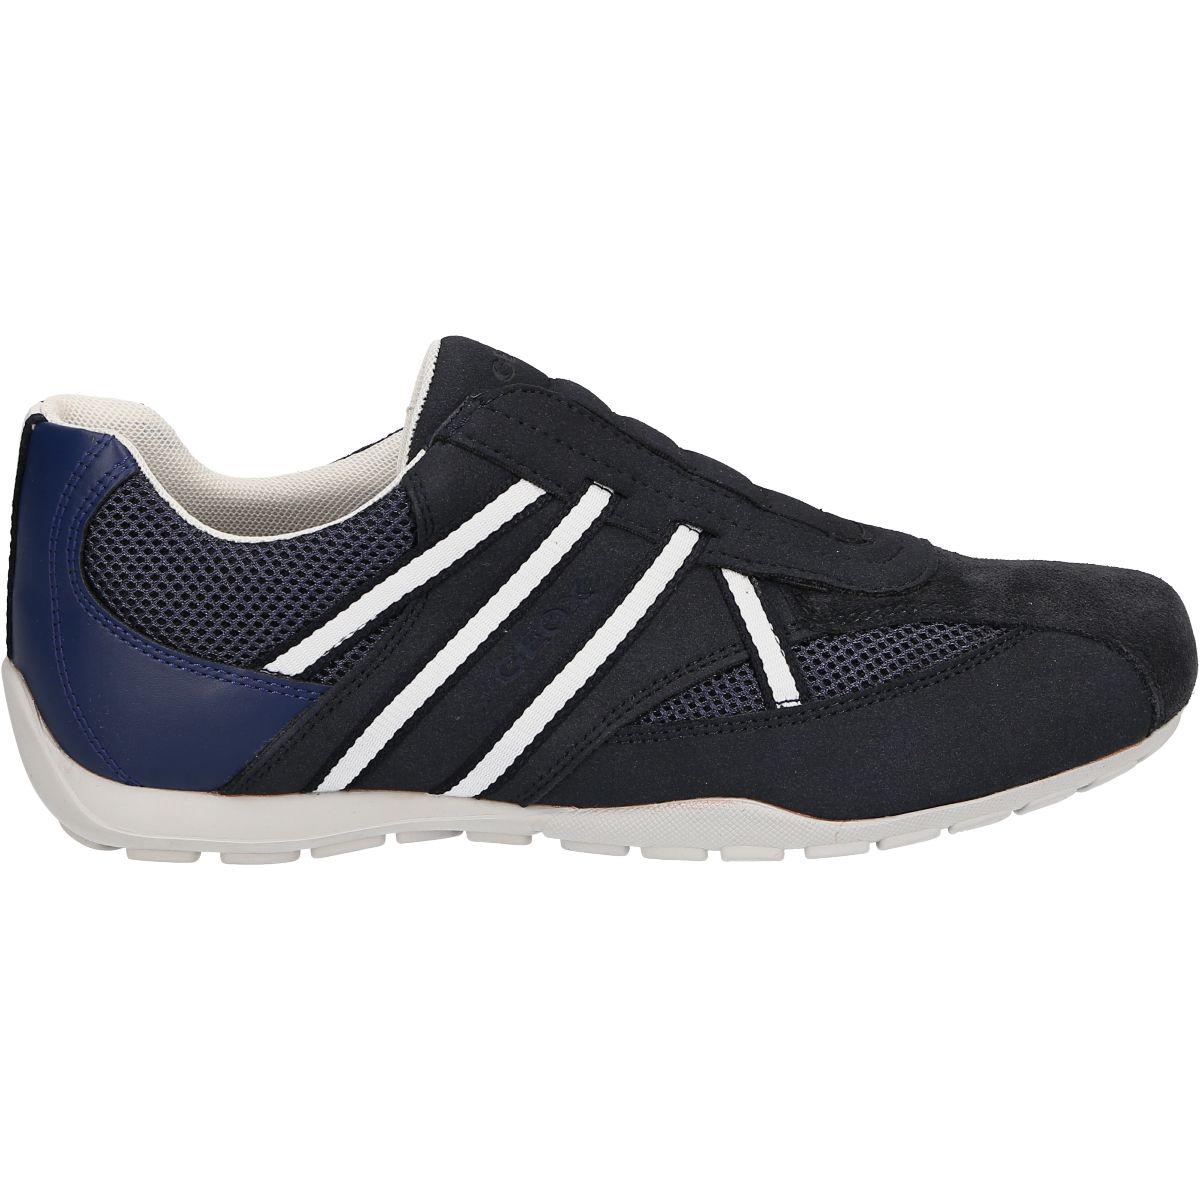 GEOX U023FD 0AU14 C4KF4 RAVEX Herrenschuhe Sneaker im Schuhe